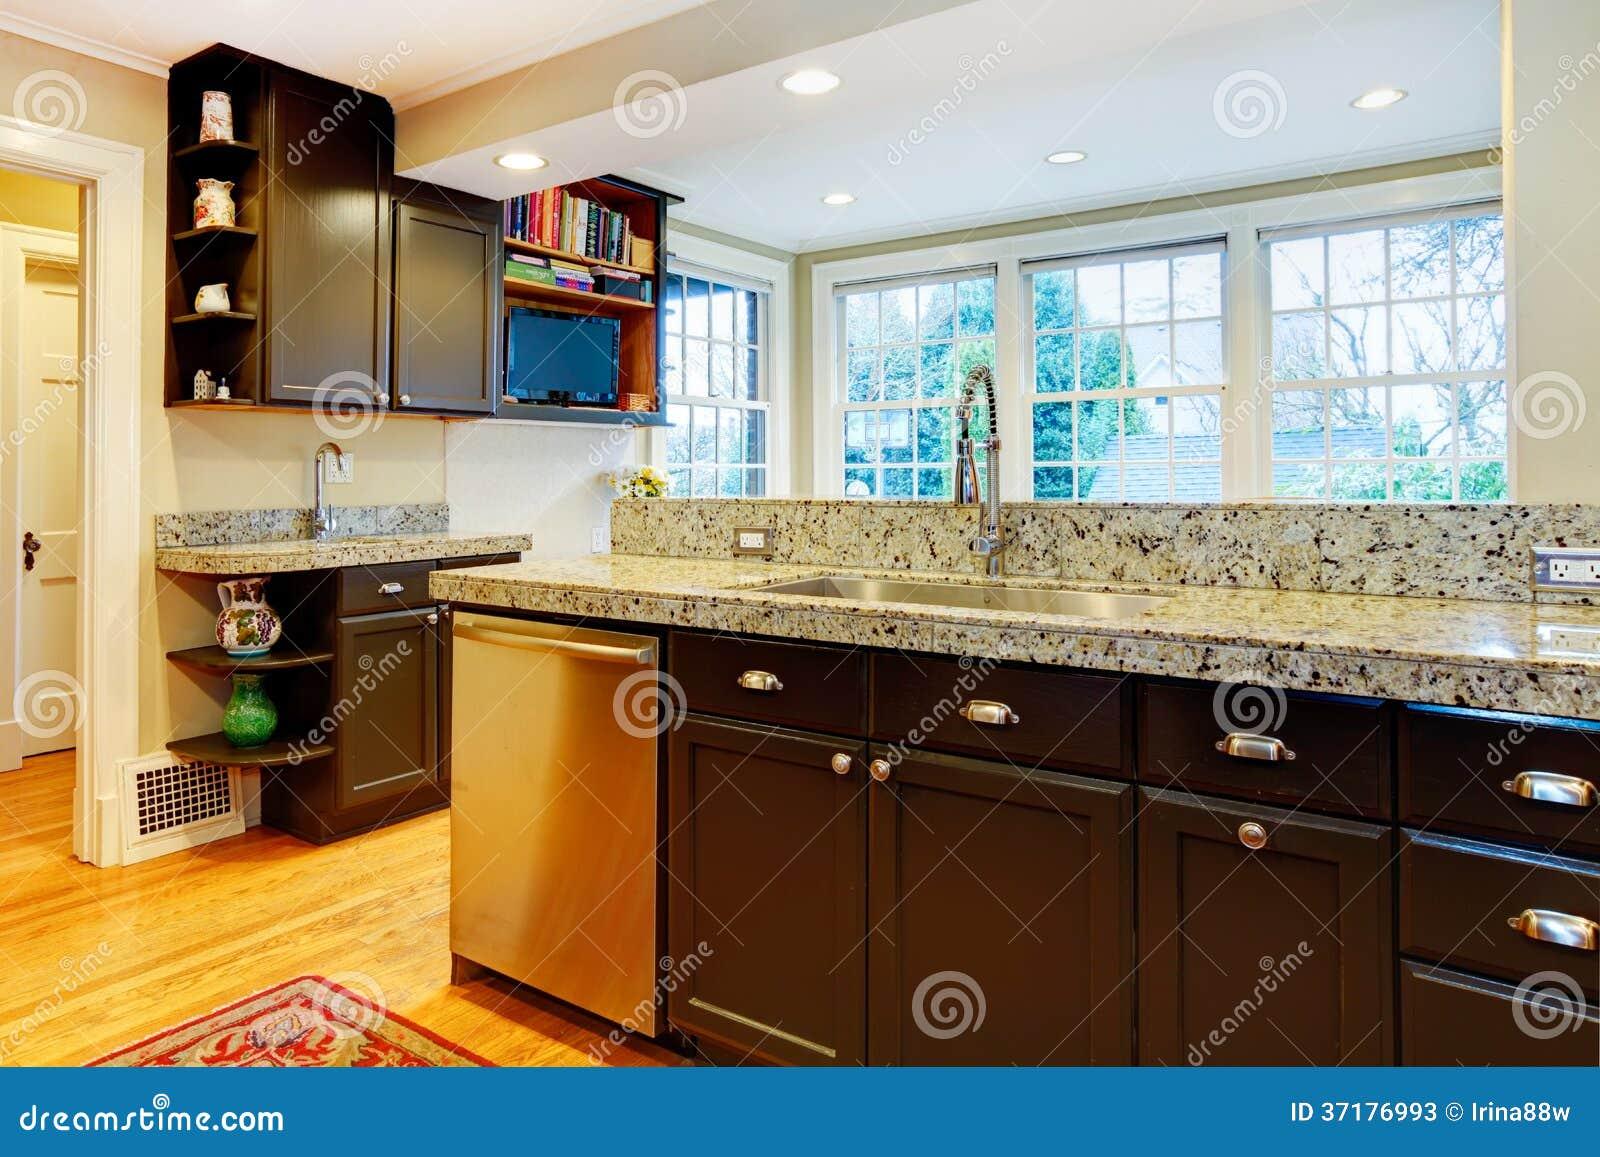 dise o de la cocina gabinetes de madera negros encimera On gabinetes de cocina negro